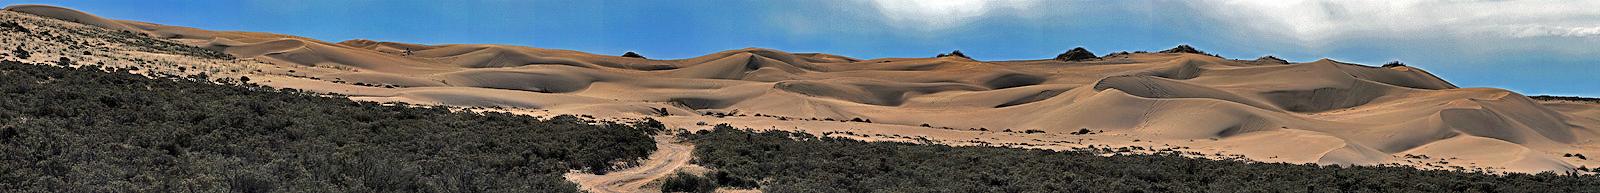 Dunes Pardelas Peninsula Valdes